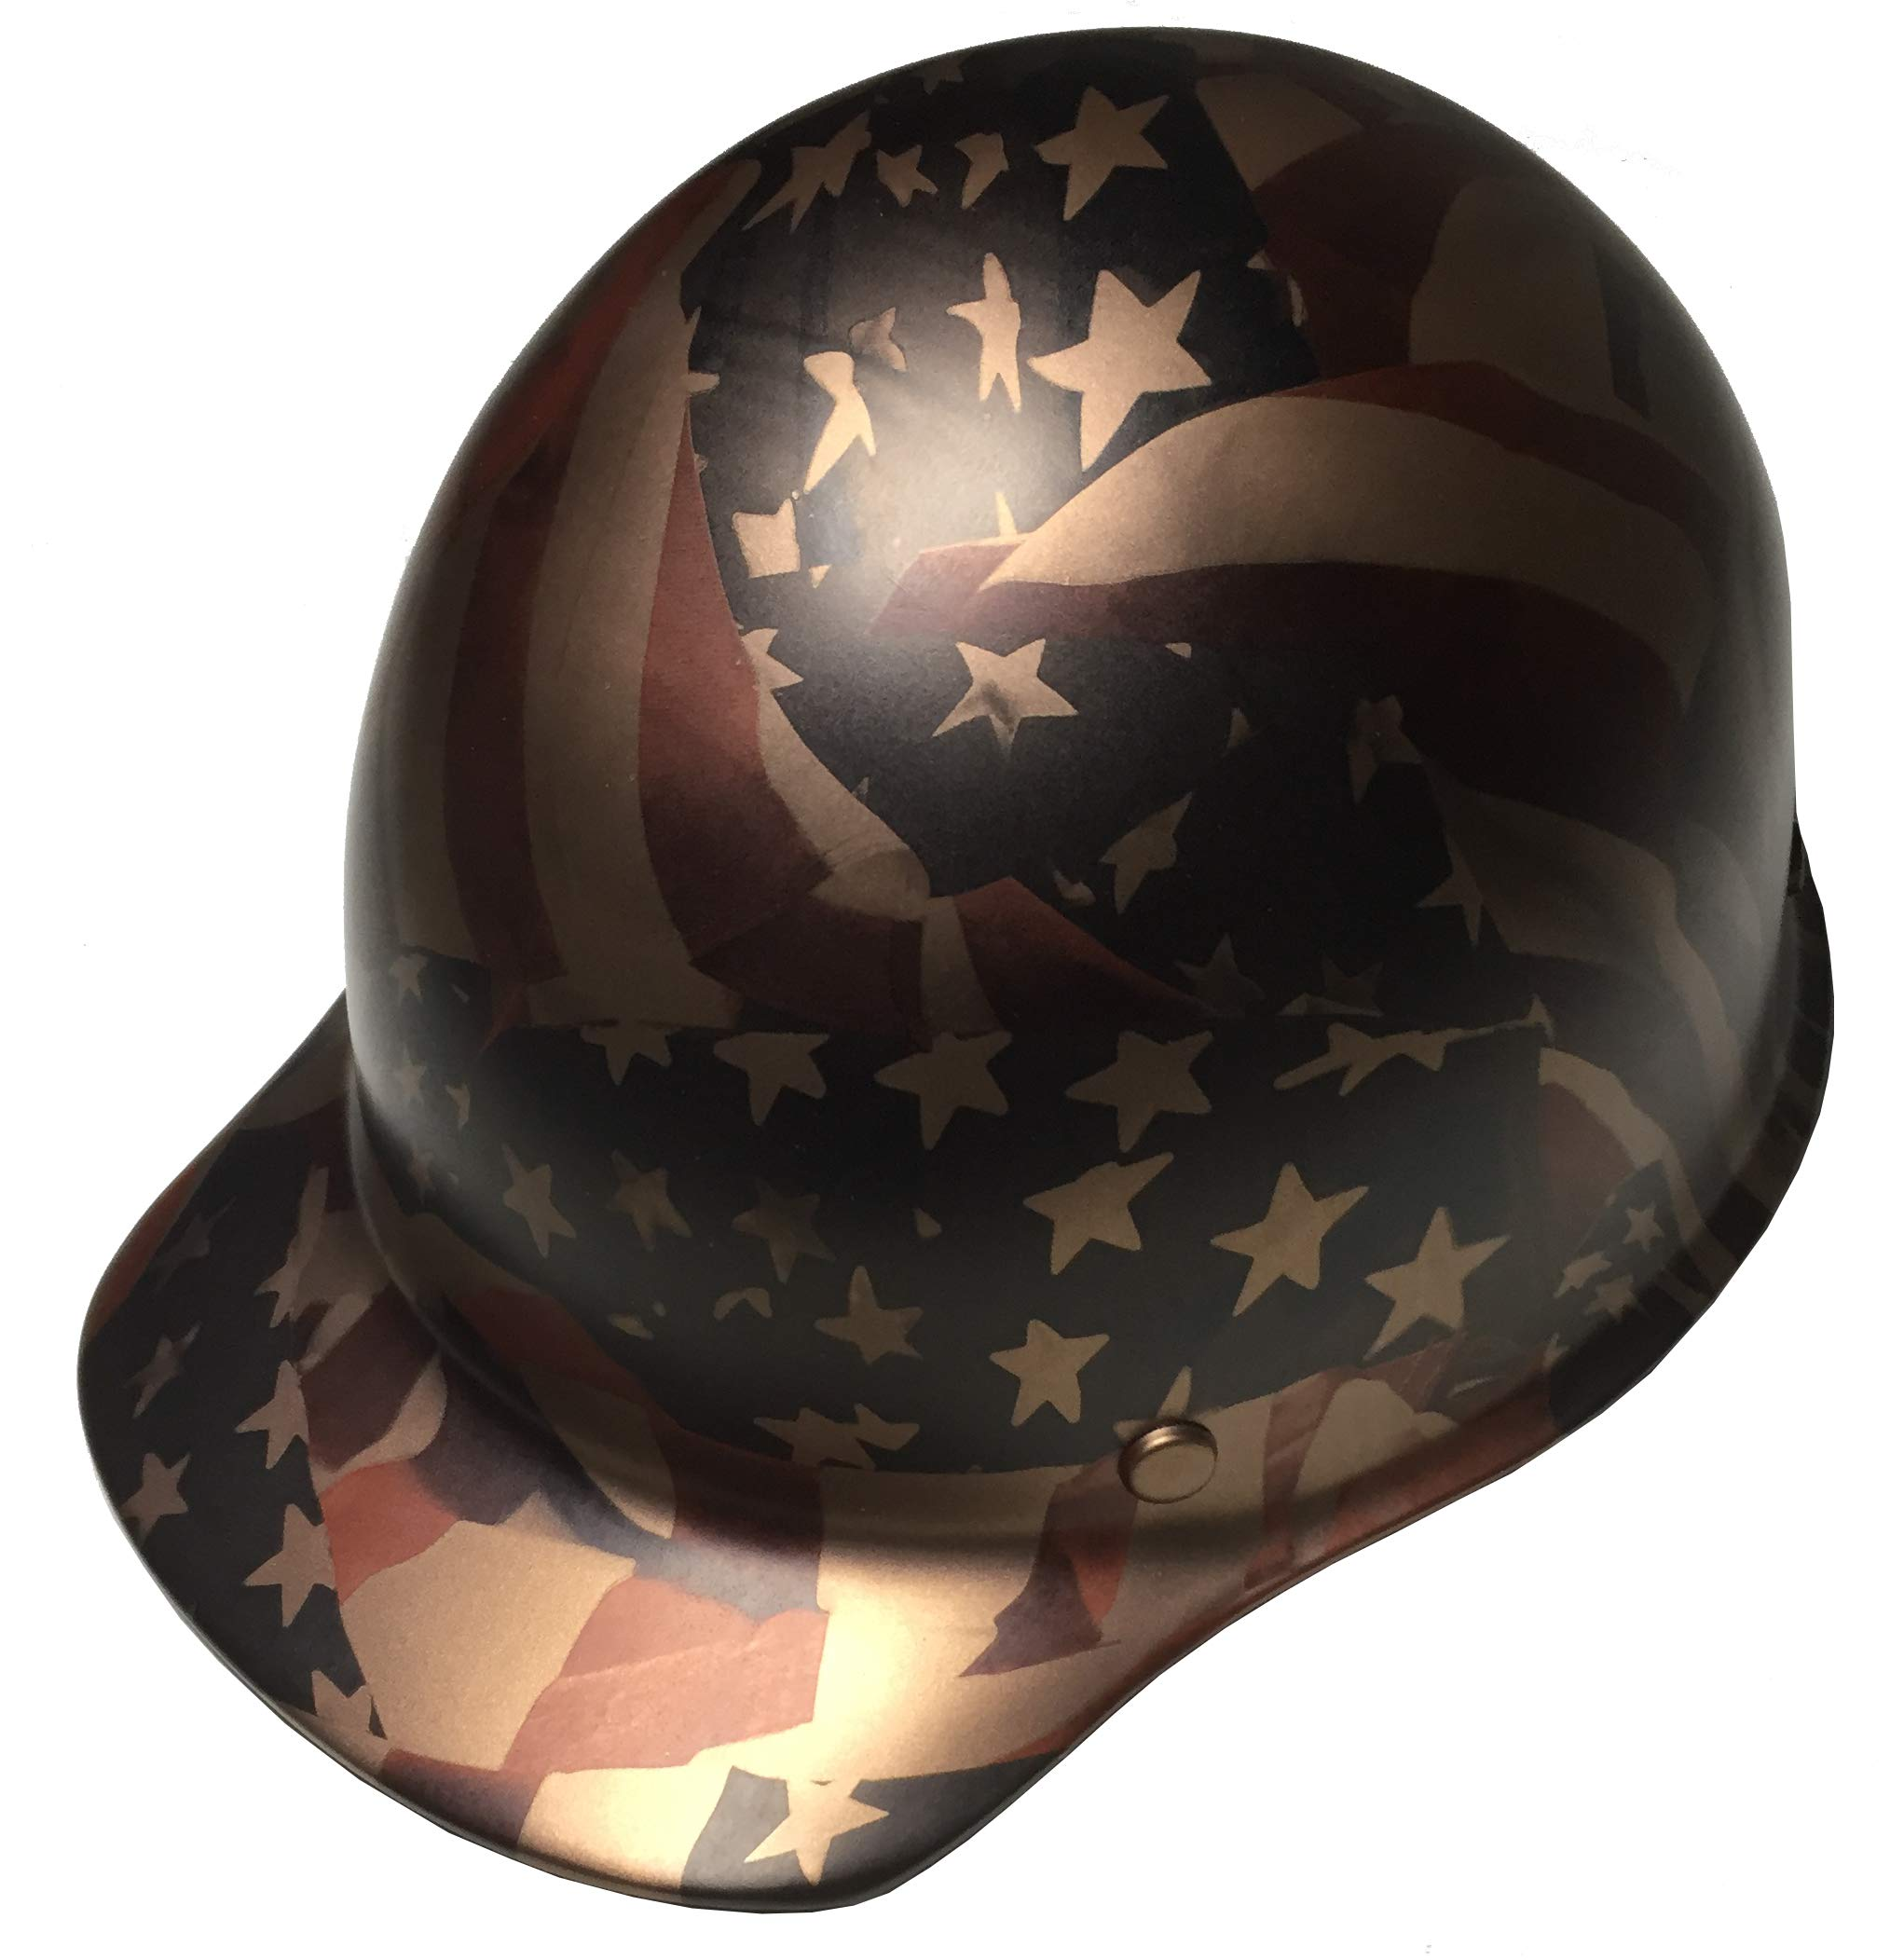 Hard Hat MSA Skullgard Cap Style Custom Copper Metallic American Flags Satin by Bag R Buck (Image #2)